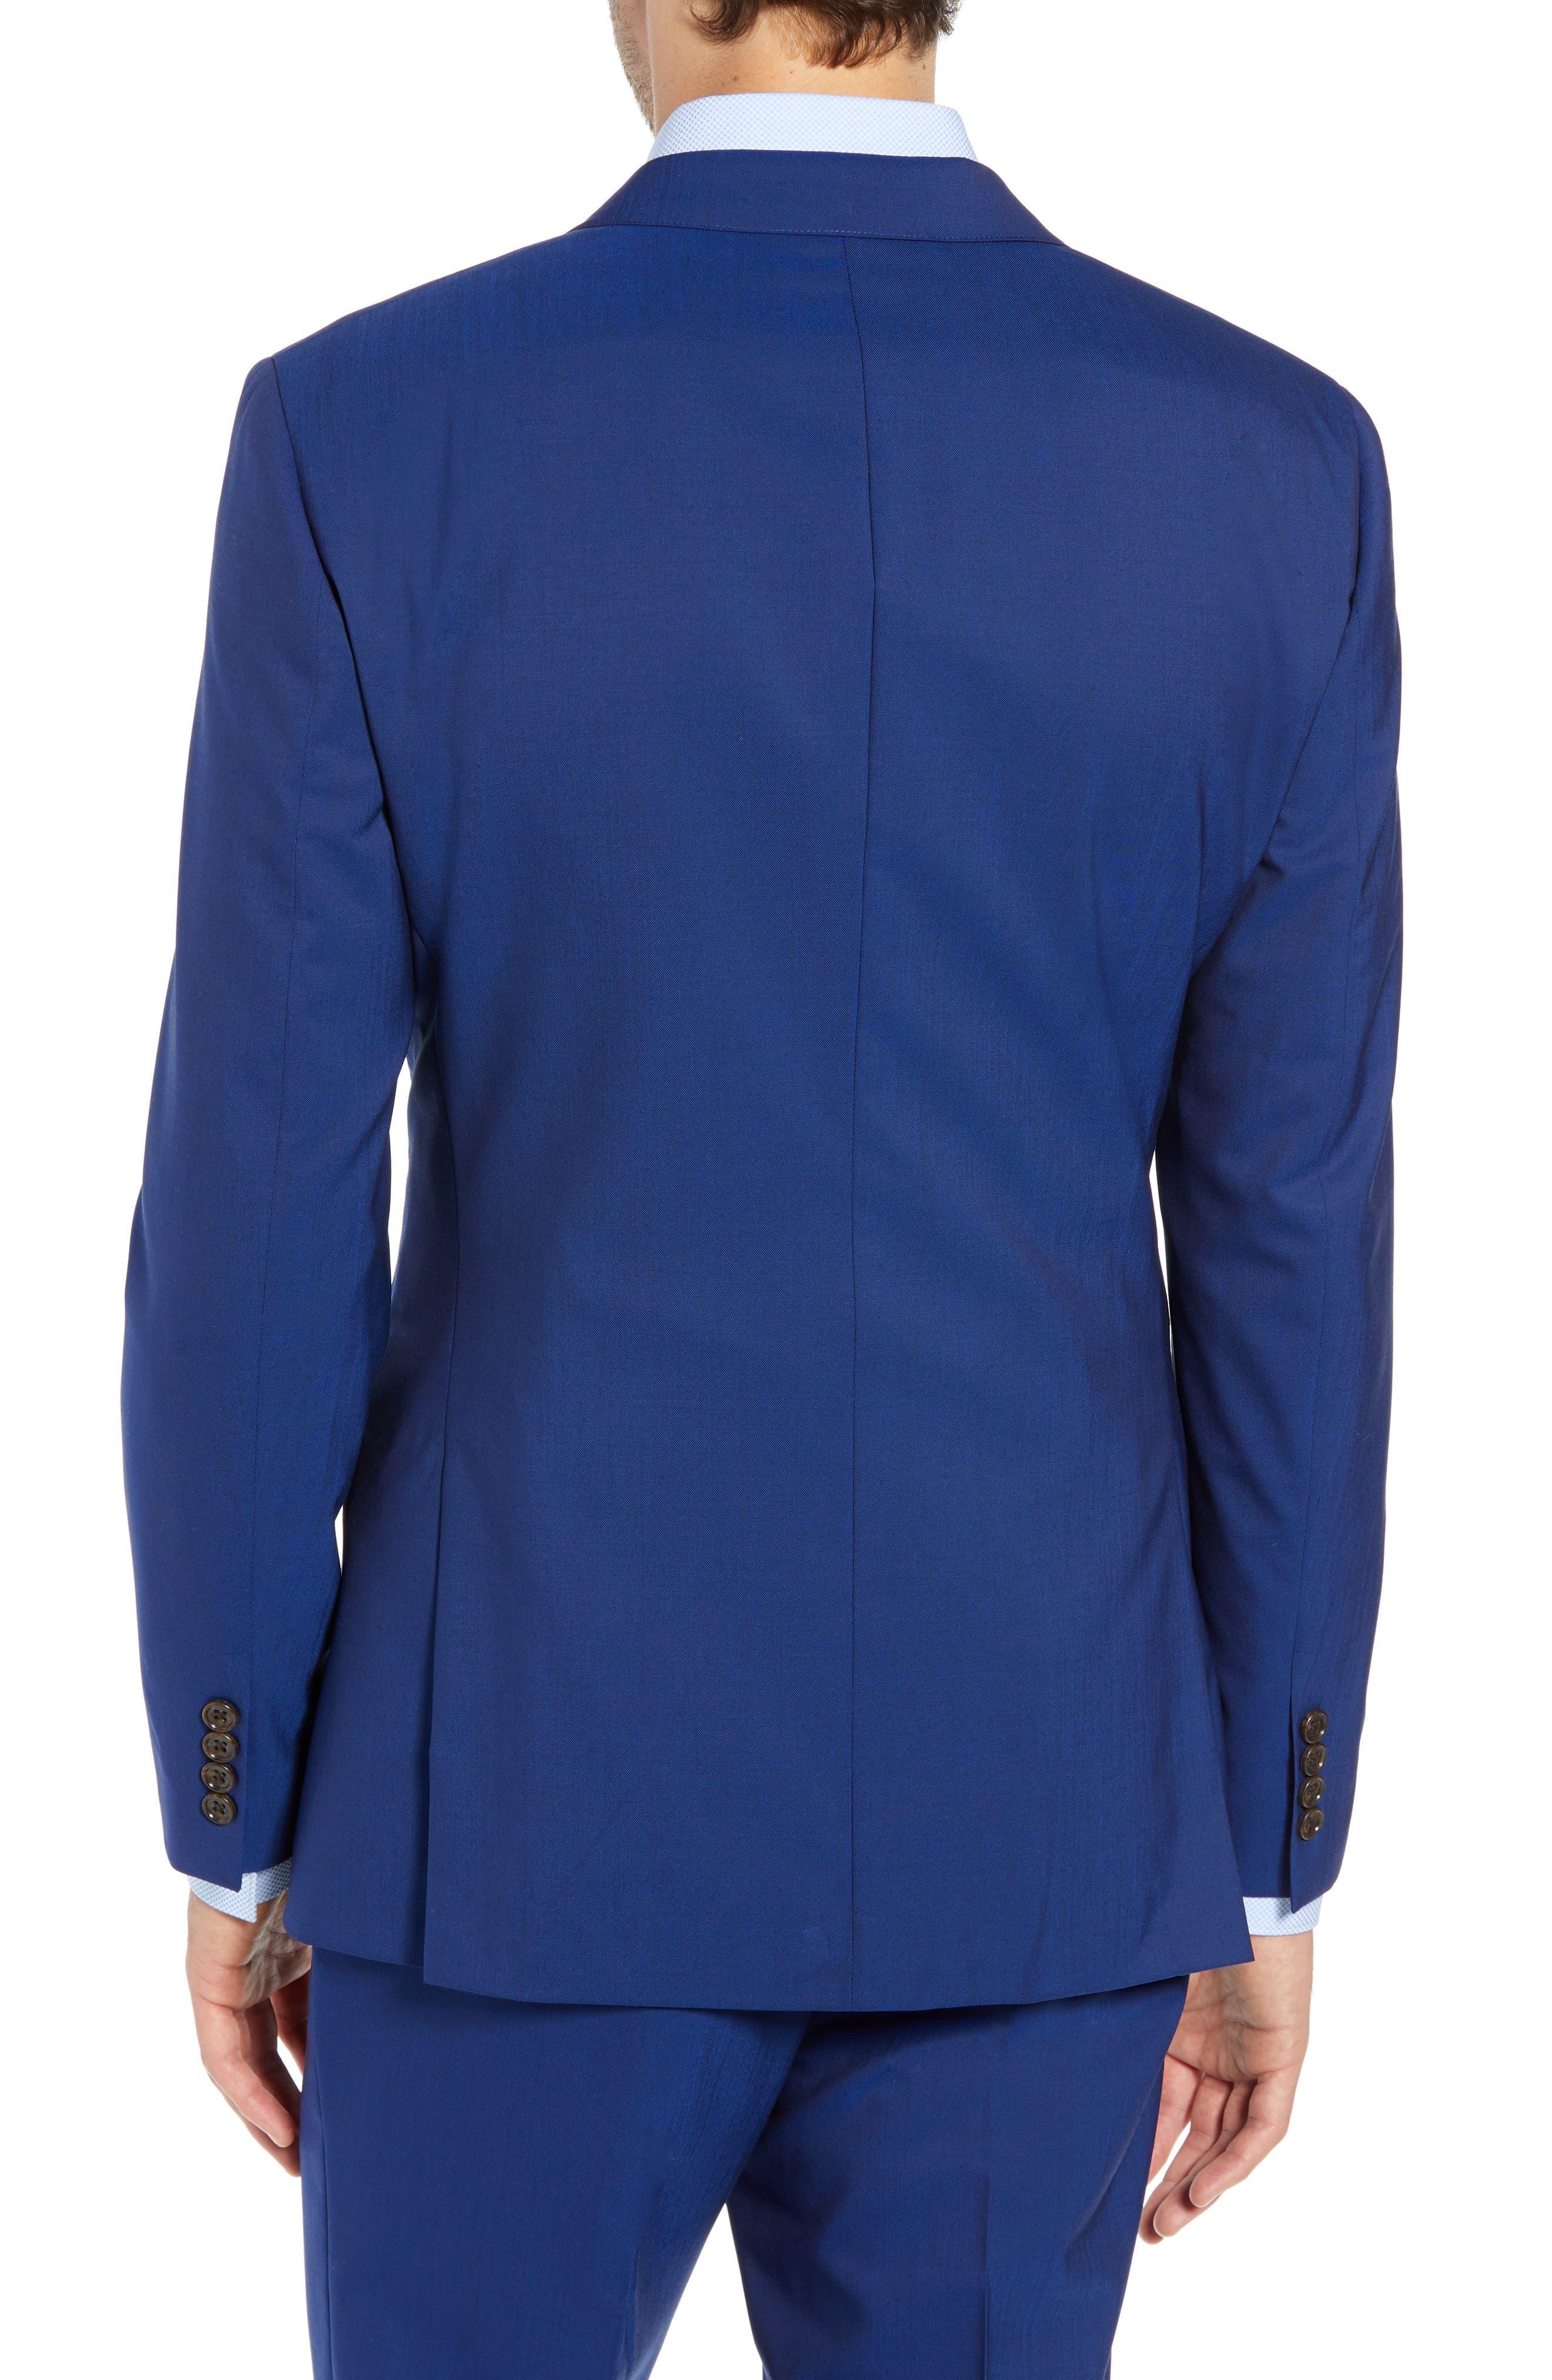 Jetsetter Slim Fit Stretch Wool Blazer,                             Alternate thumbnail 2, color,                             BRILLIANT NAVY